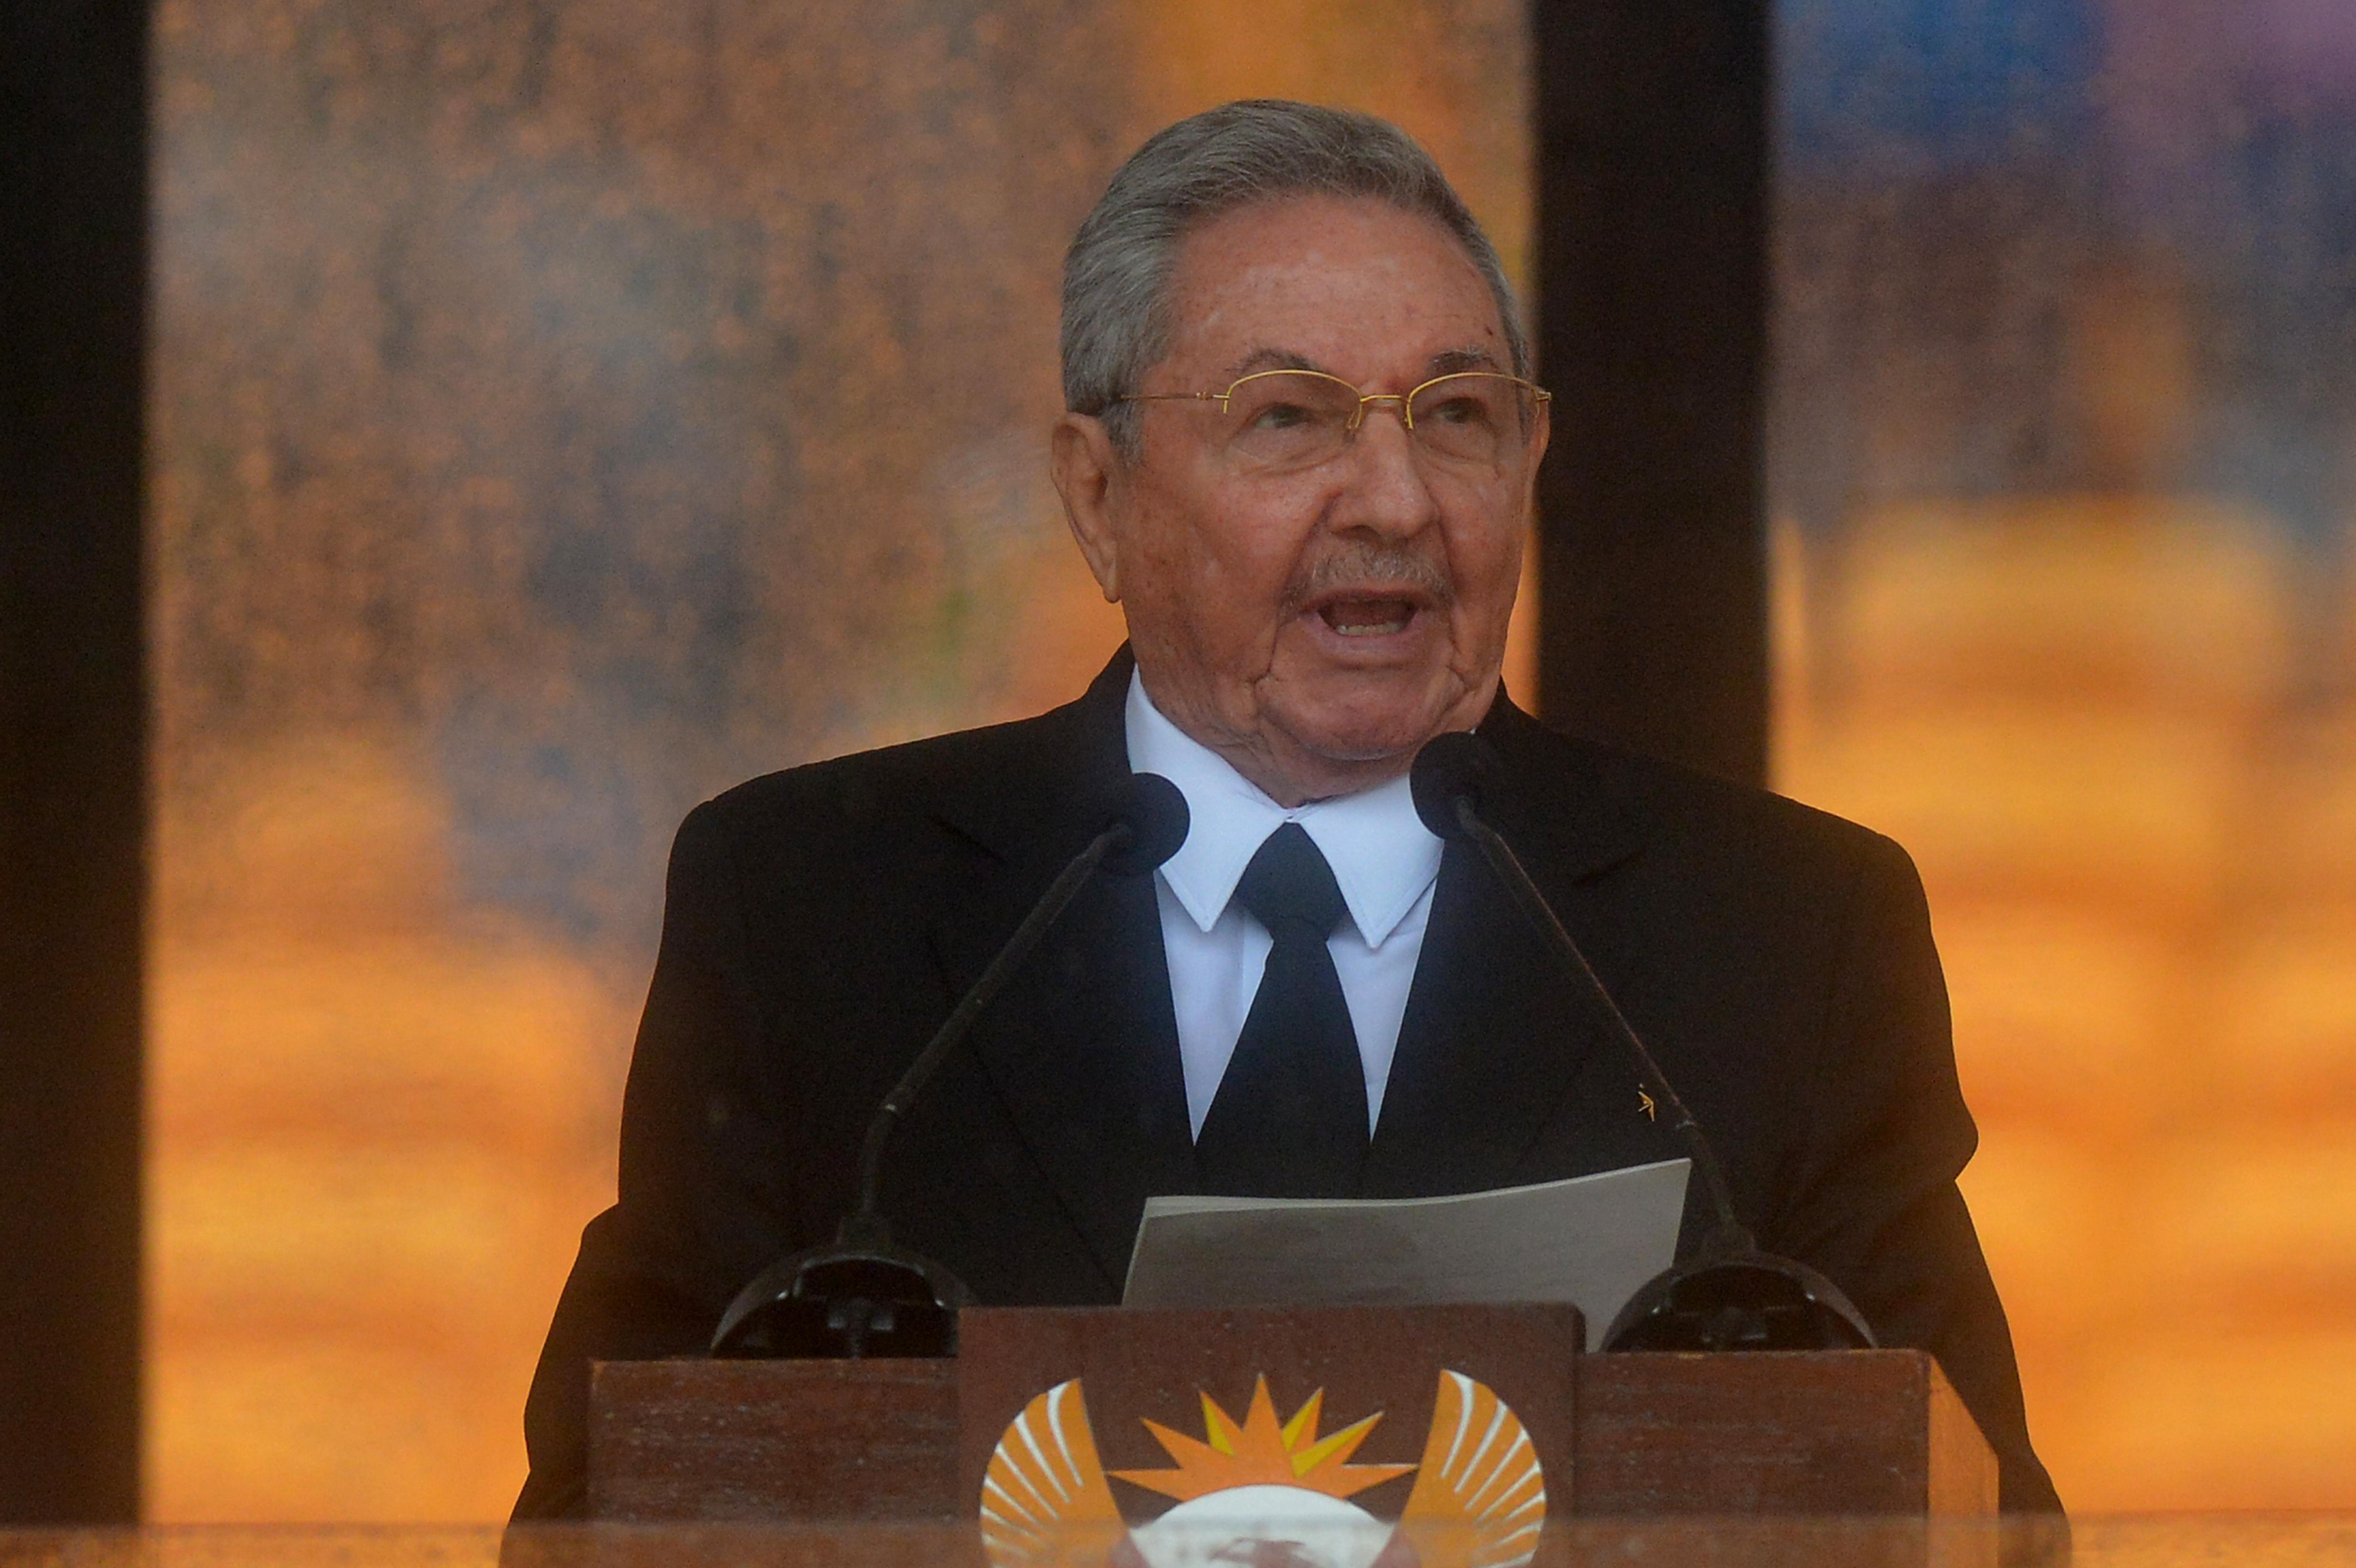 Raúl Castro: U.S. And Cuba Can Have 'Civilized Relationship'